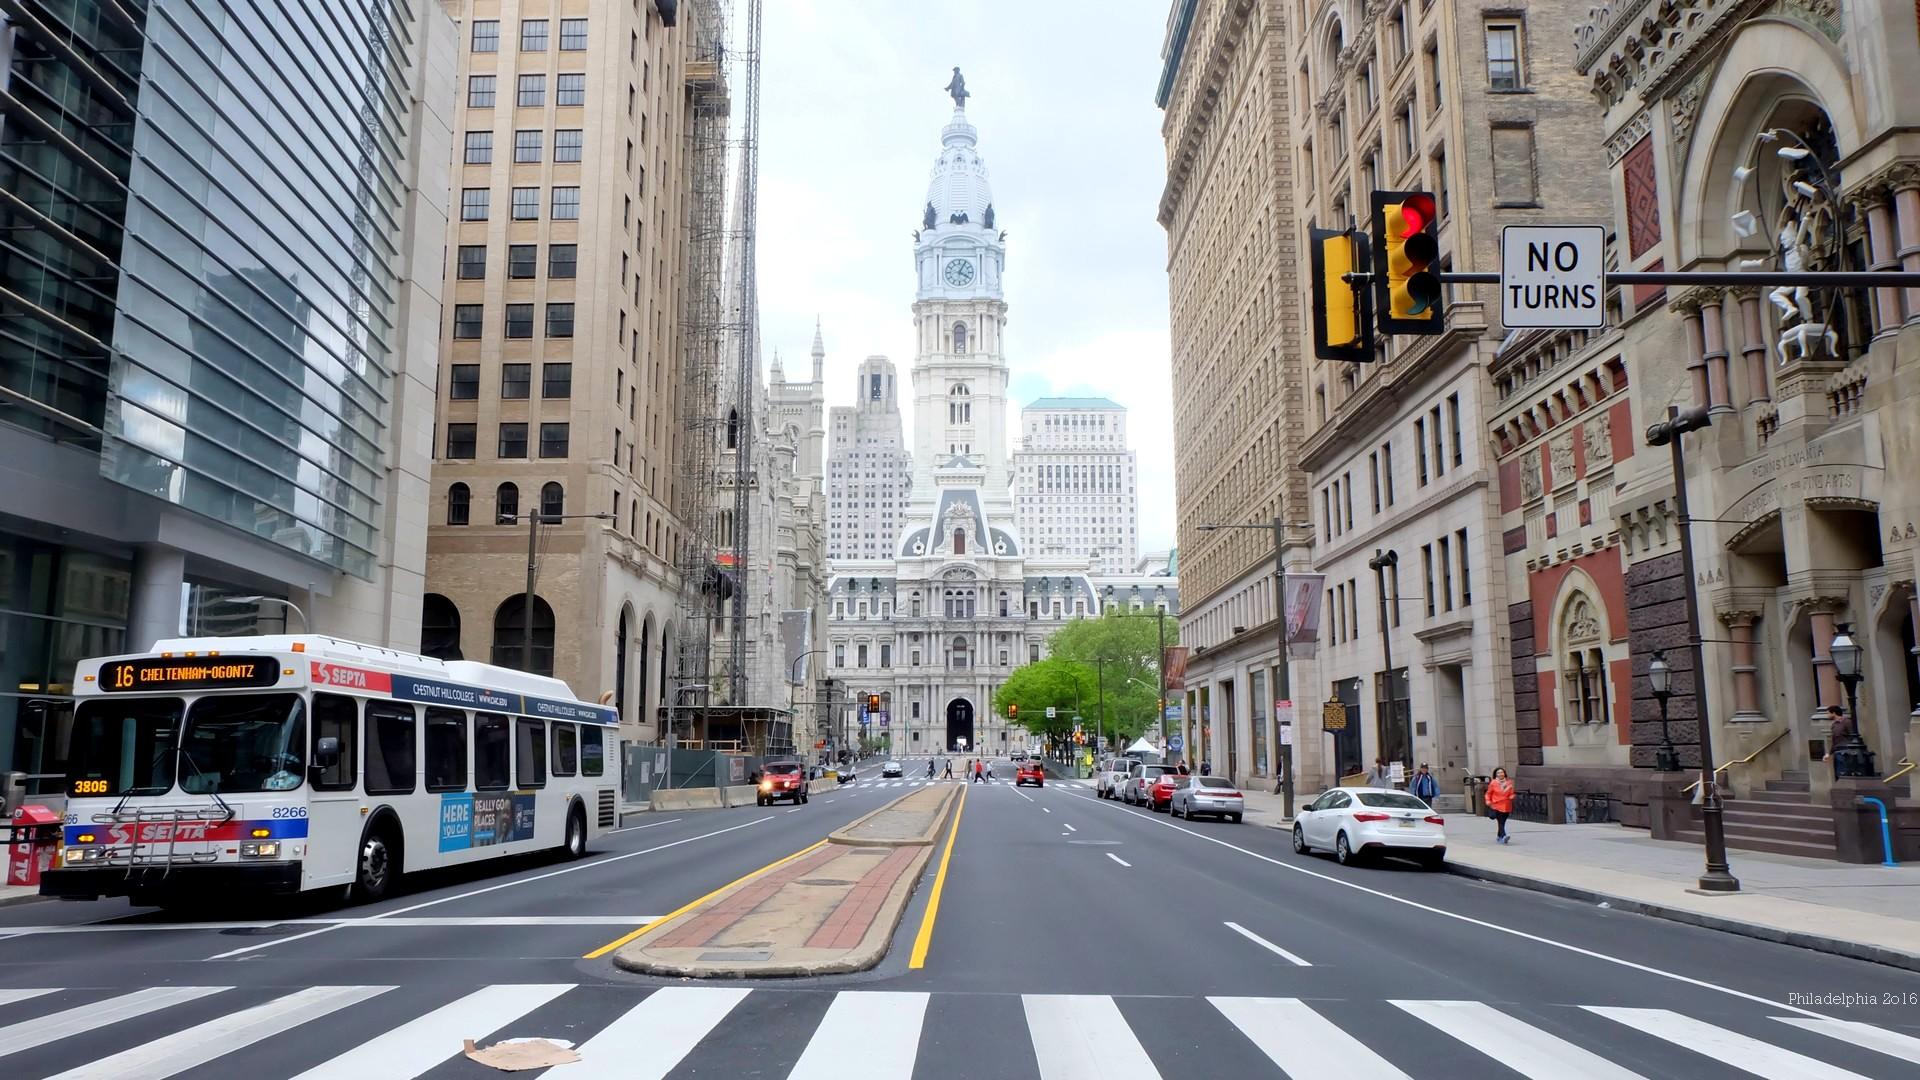 Philly, PA, USA